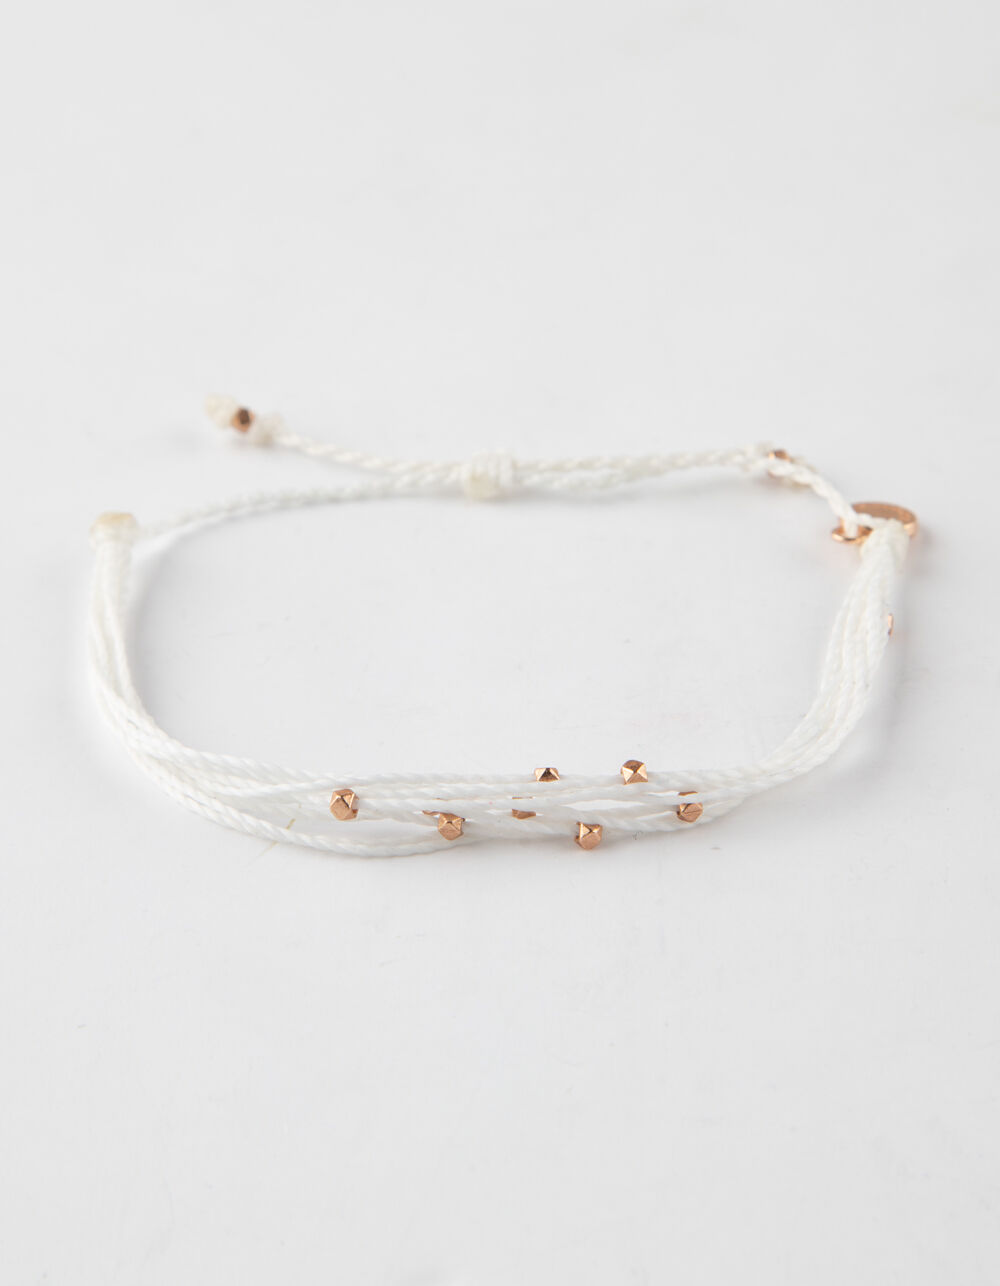 PURA VIDA Malibu Rose Gold & White Bracelet